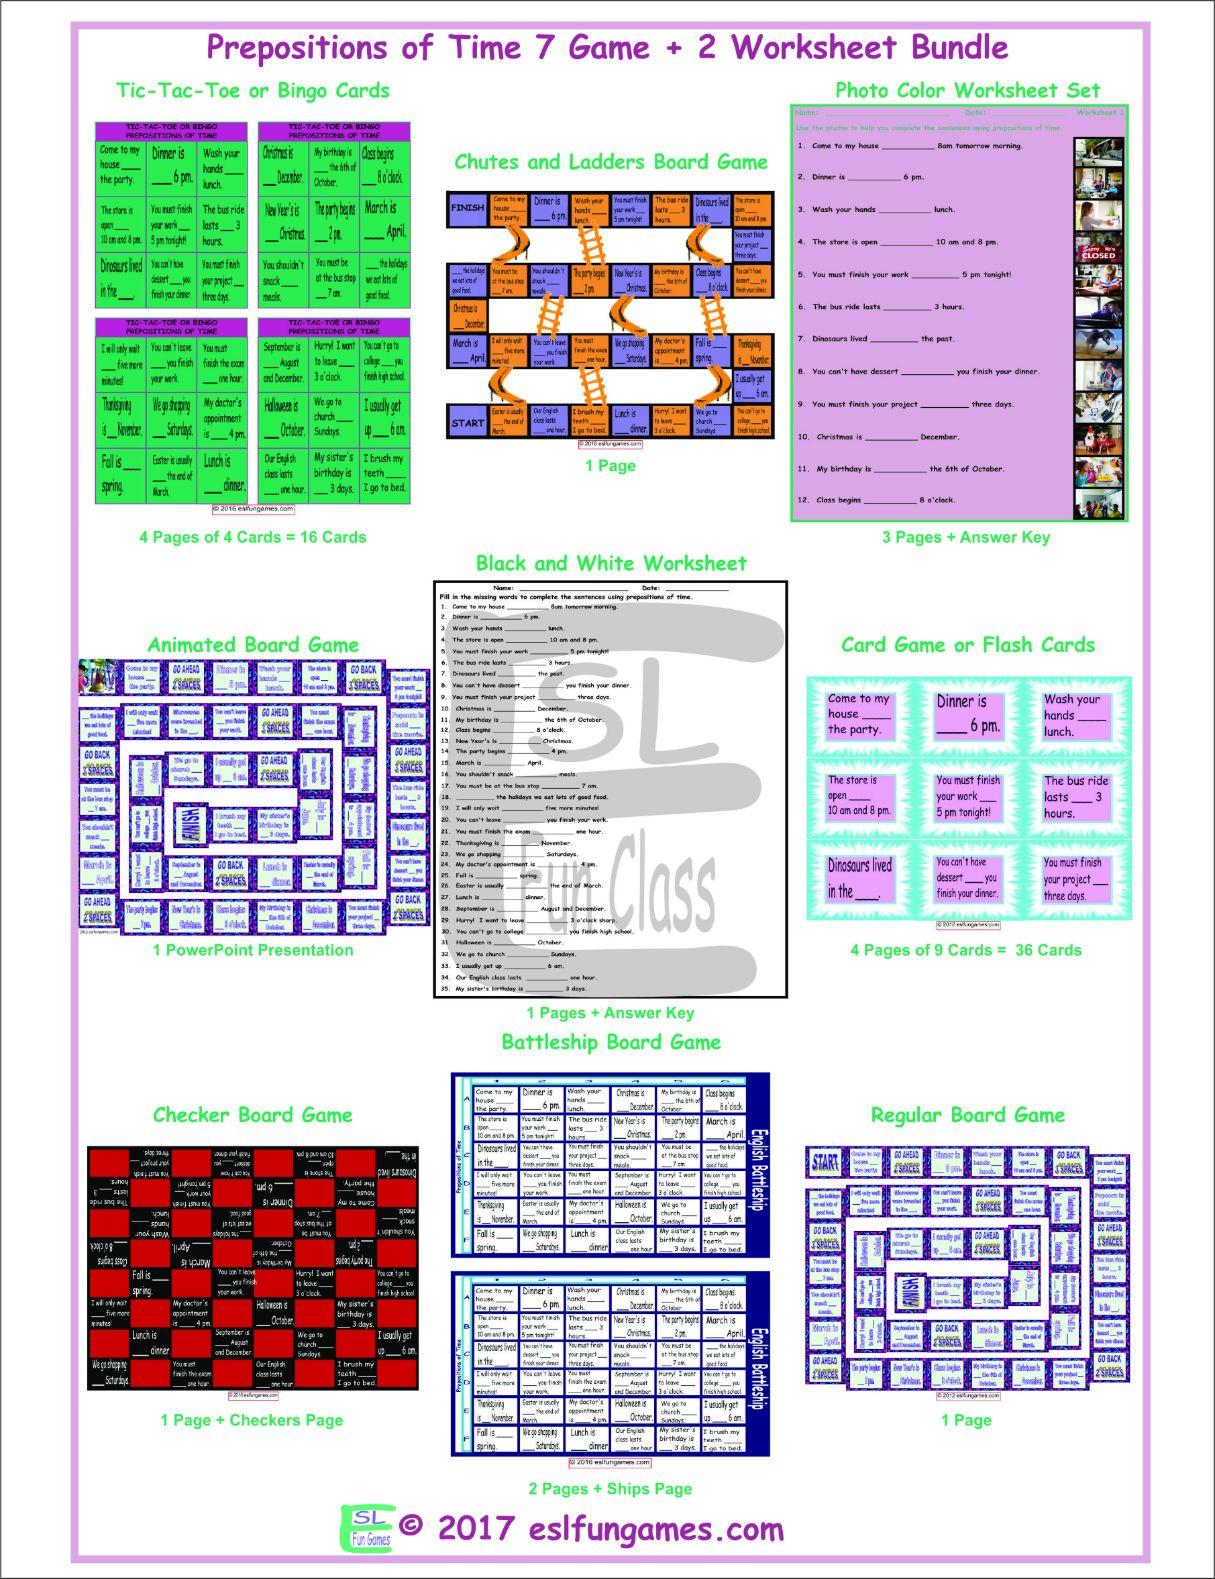 Prepositions Of Time 7 Game Plus 2 Worksheet Bundle By Eslfungames